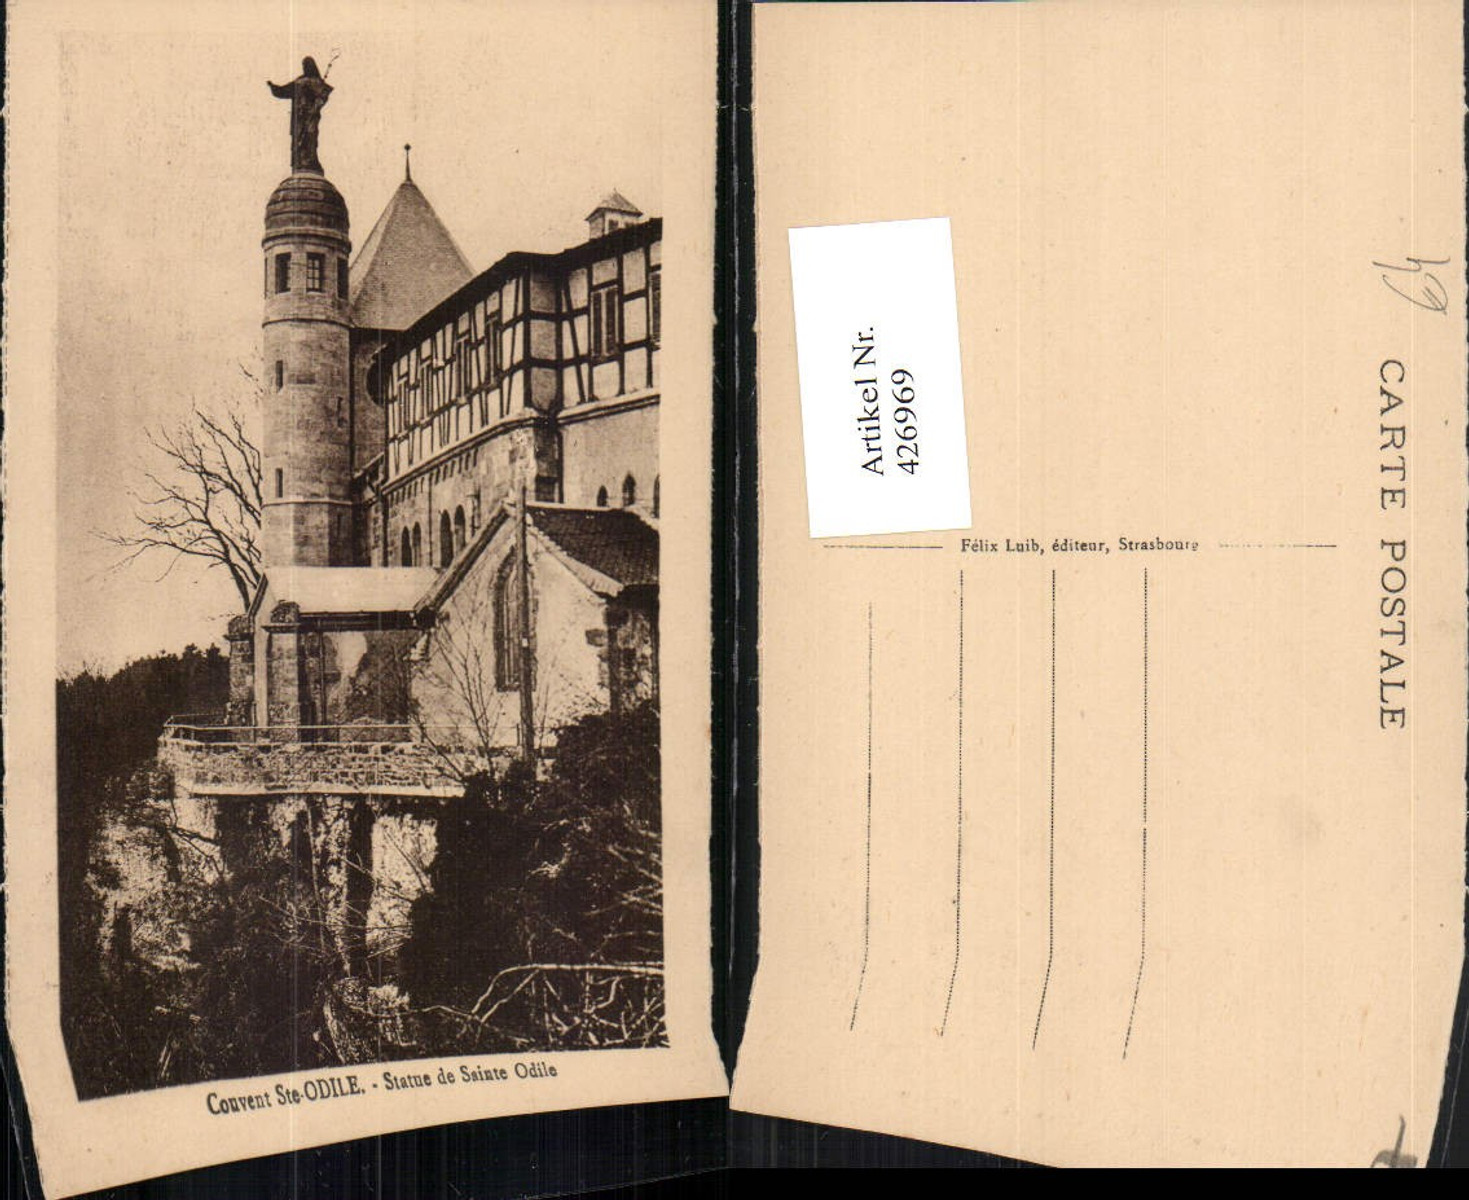 426969,Elsass Bas-Rhin Kloster Couvent Ste-Odile Statue de Sainte Odile günstig online kaufen